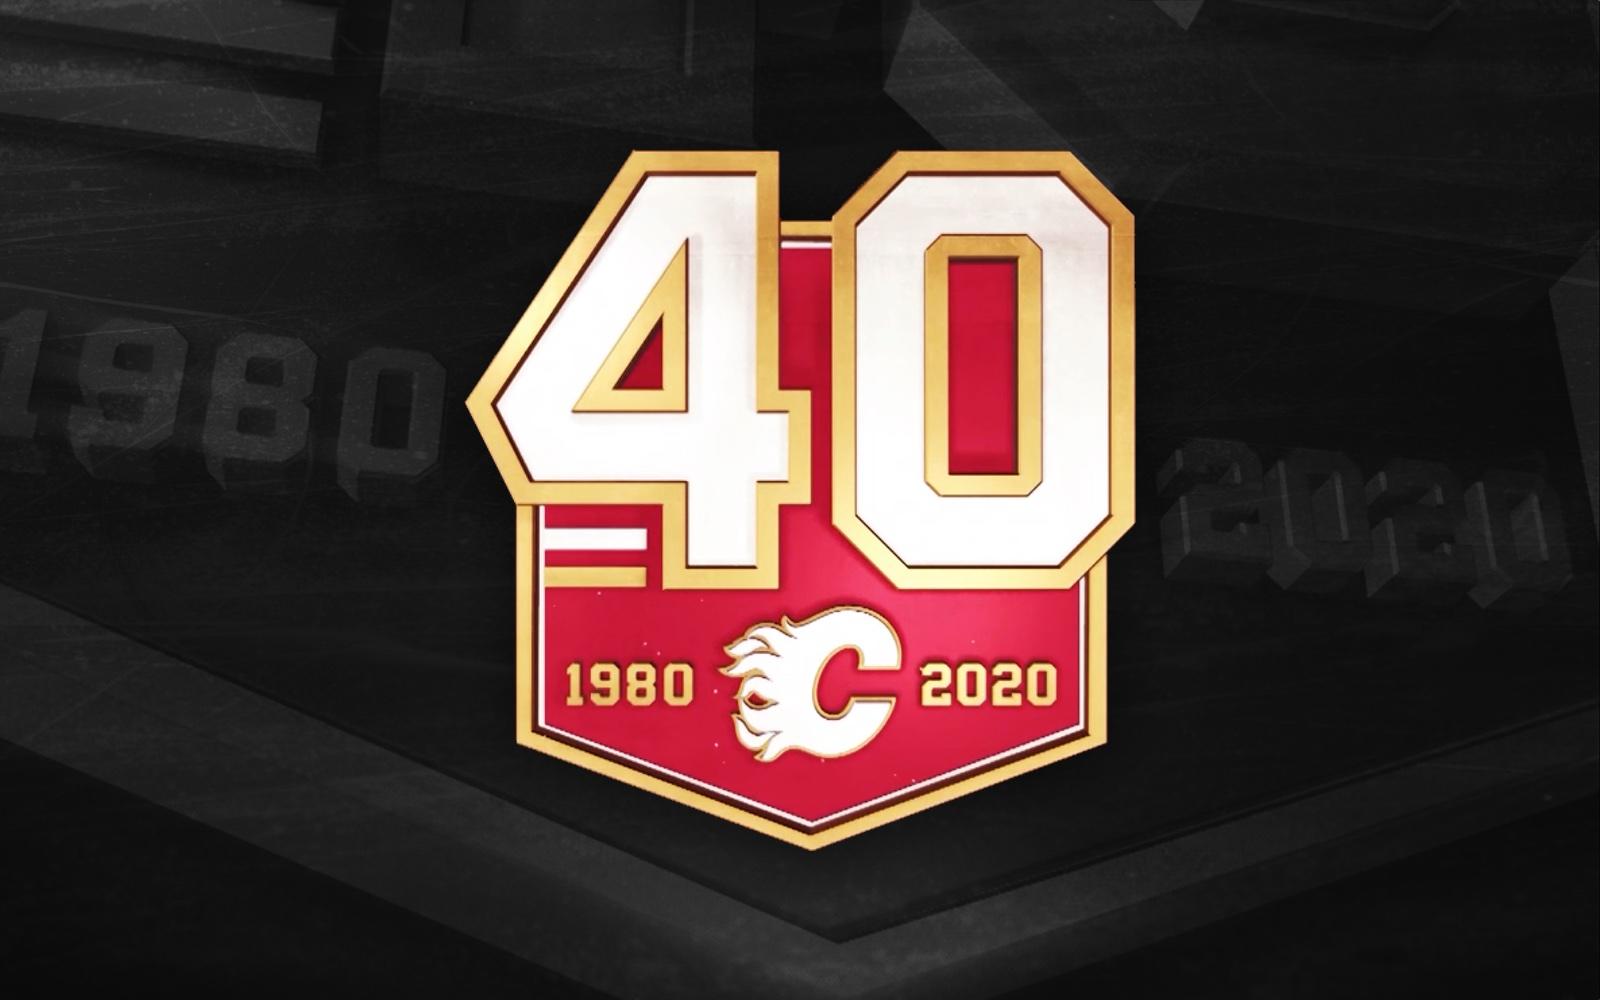 Calgary Flames reveal 40th anniversary logo